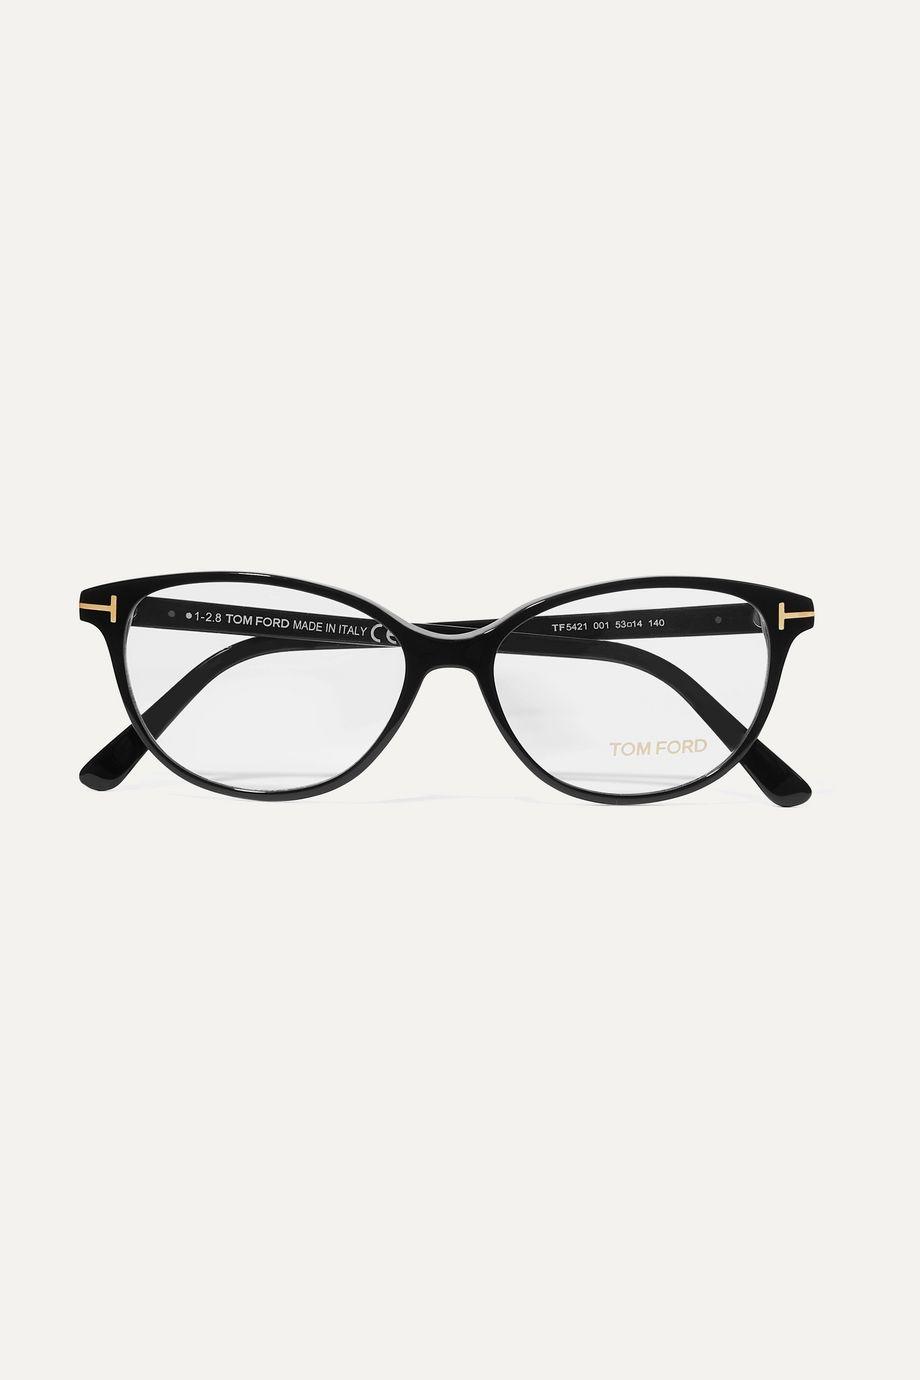 TOM FORD D-frame acetate optical glasses